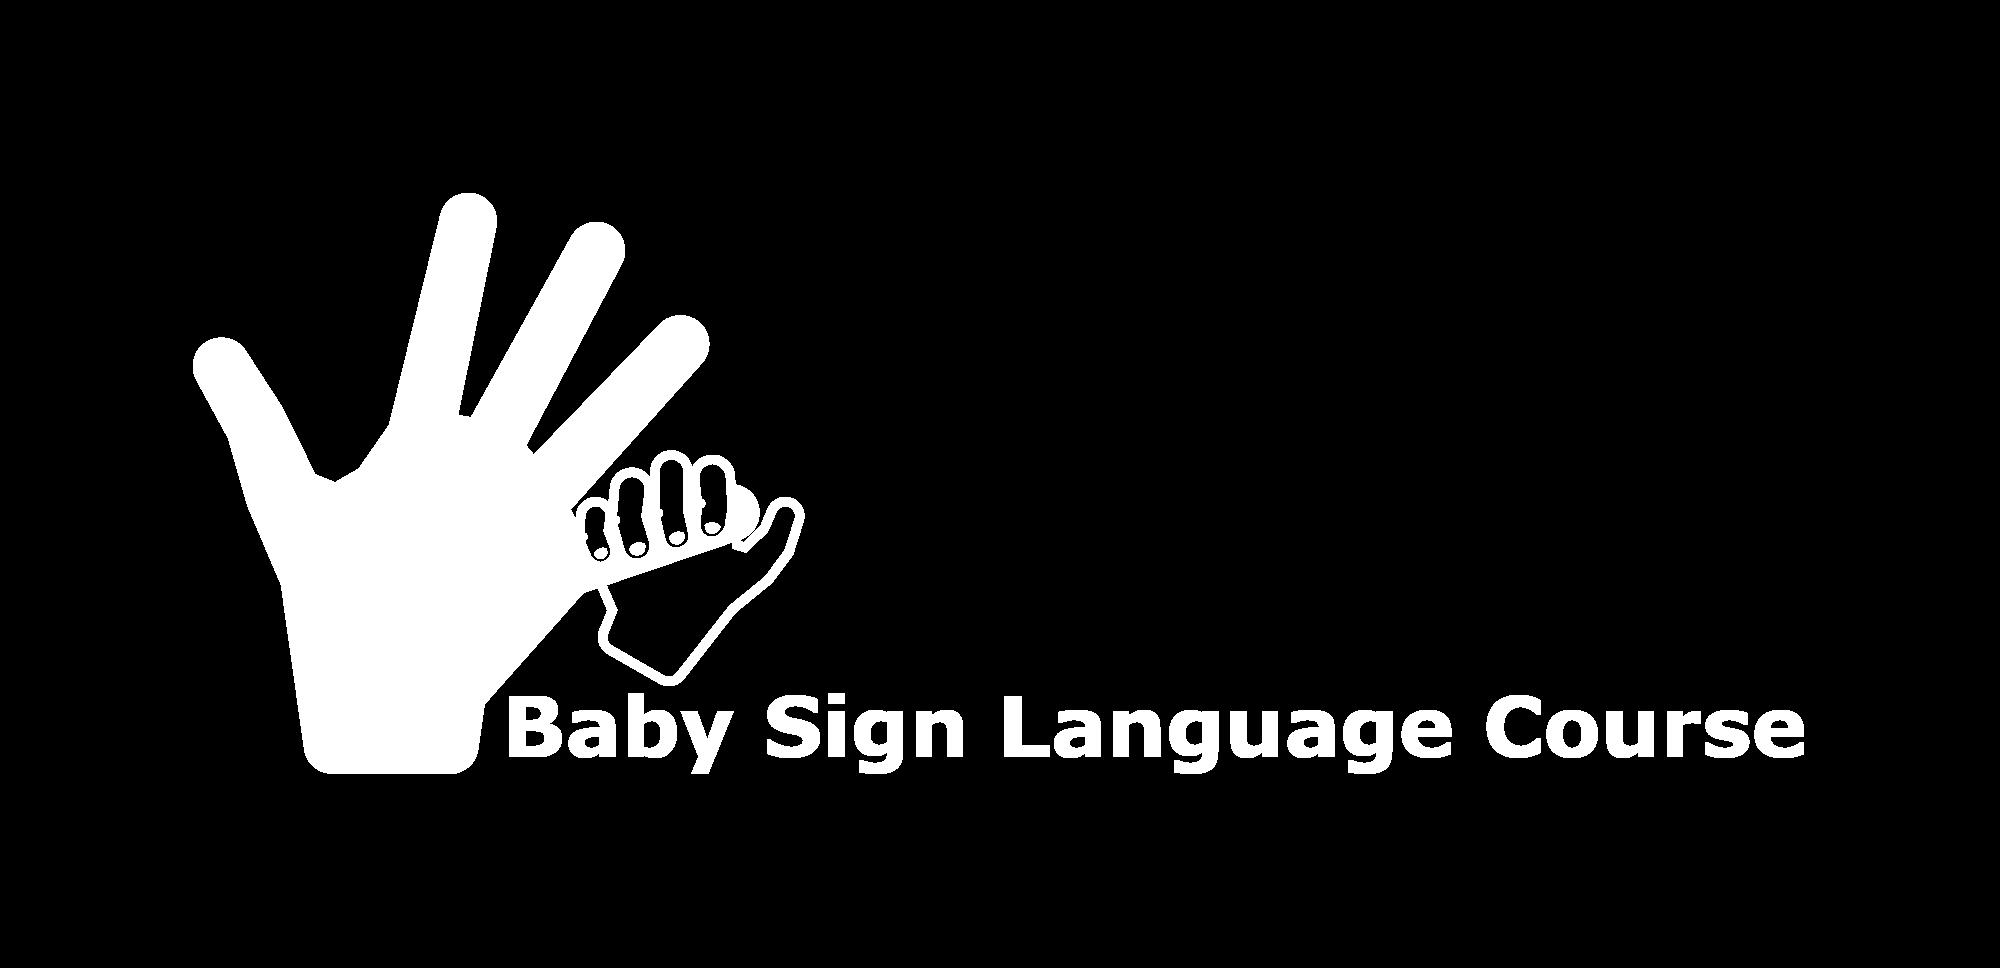 Baby Sign Language Course-logo-white